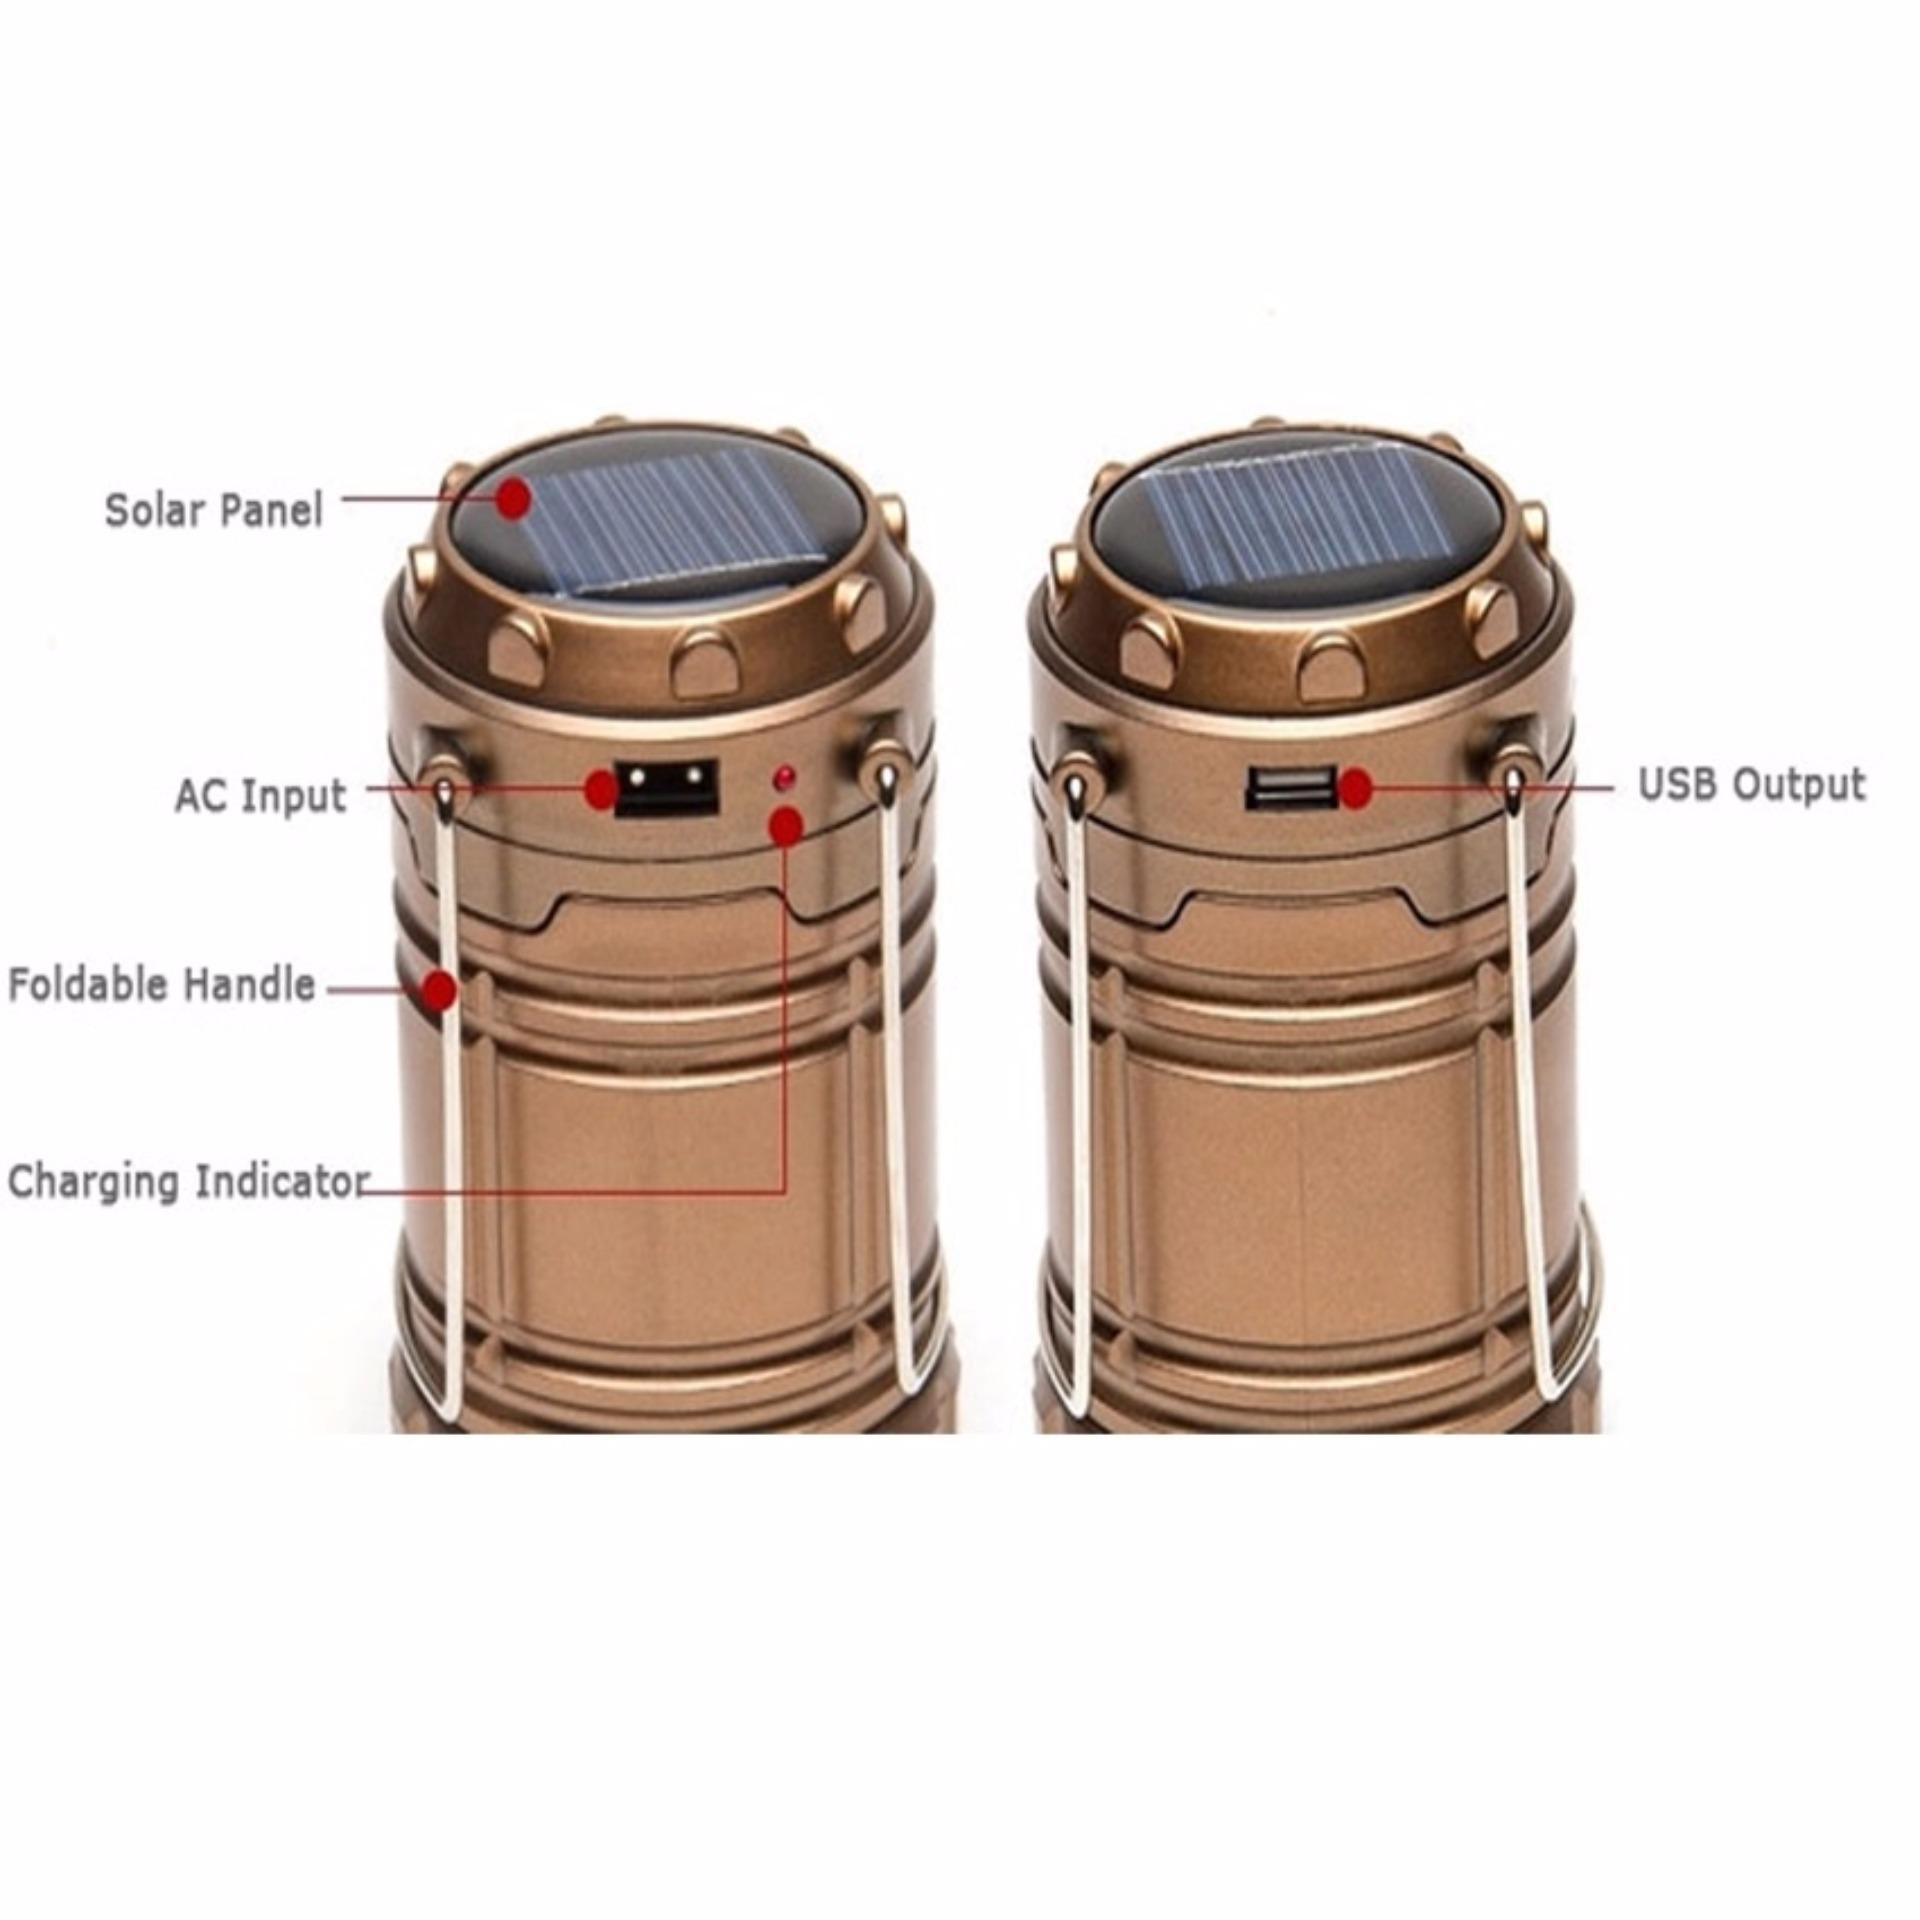 ... Prime Lampu Lentera Camping LED Solar - Rechargeable Emergency Lamp - Emas ...